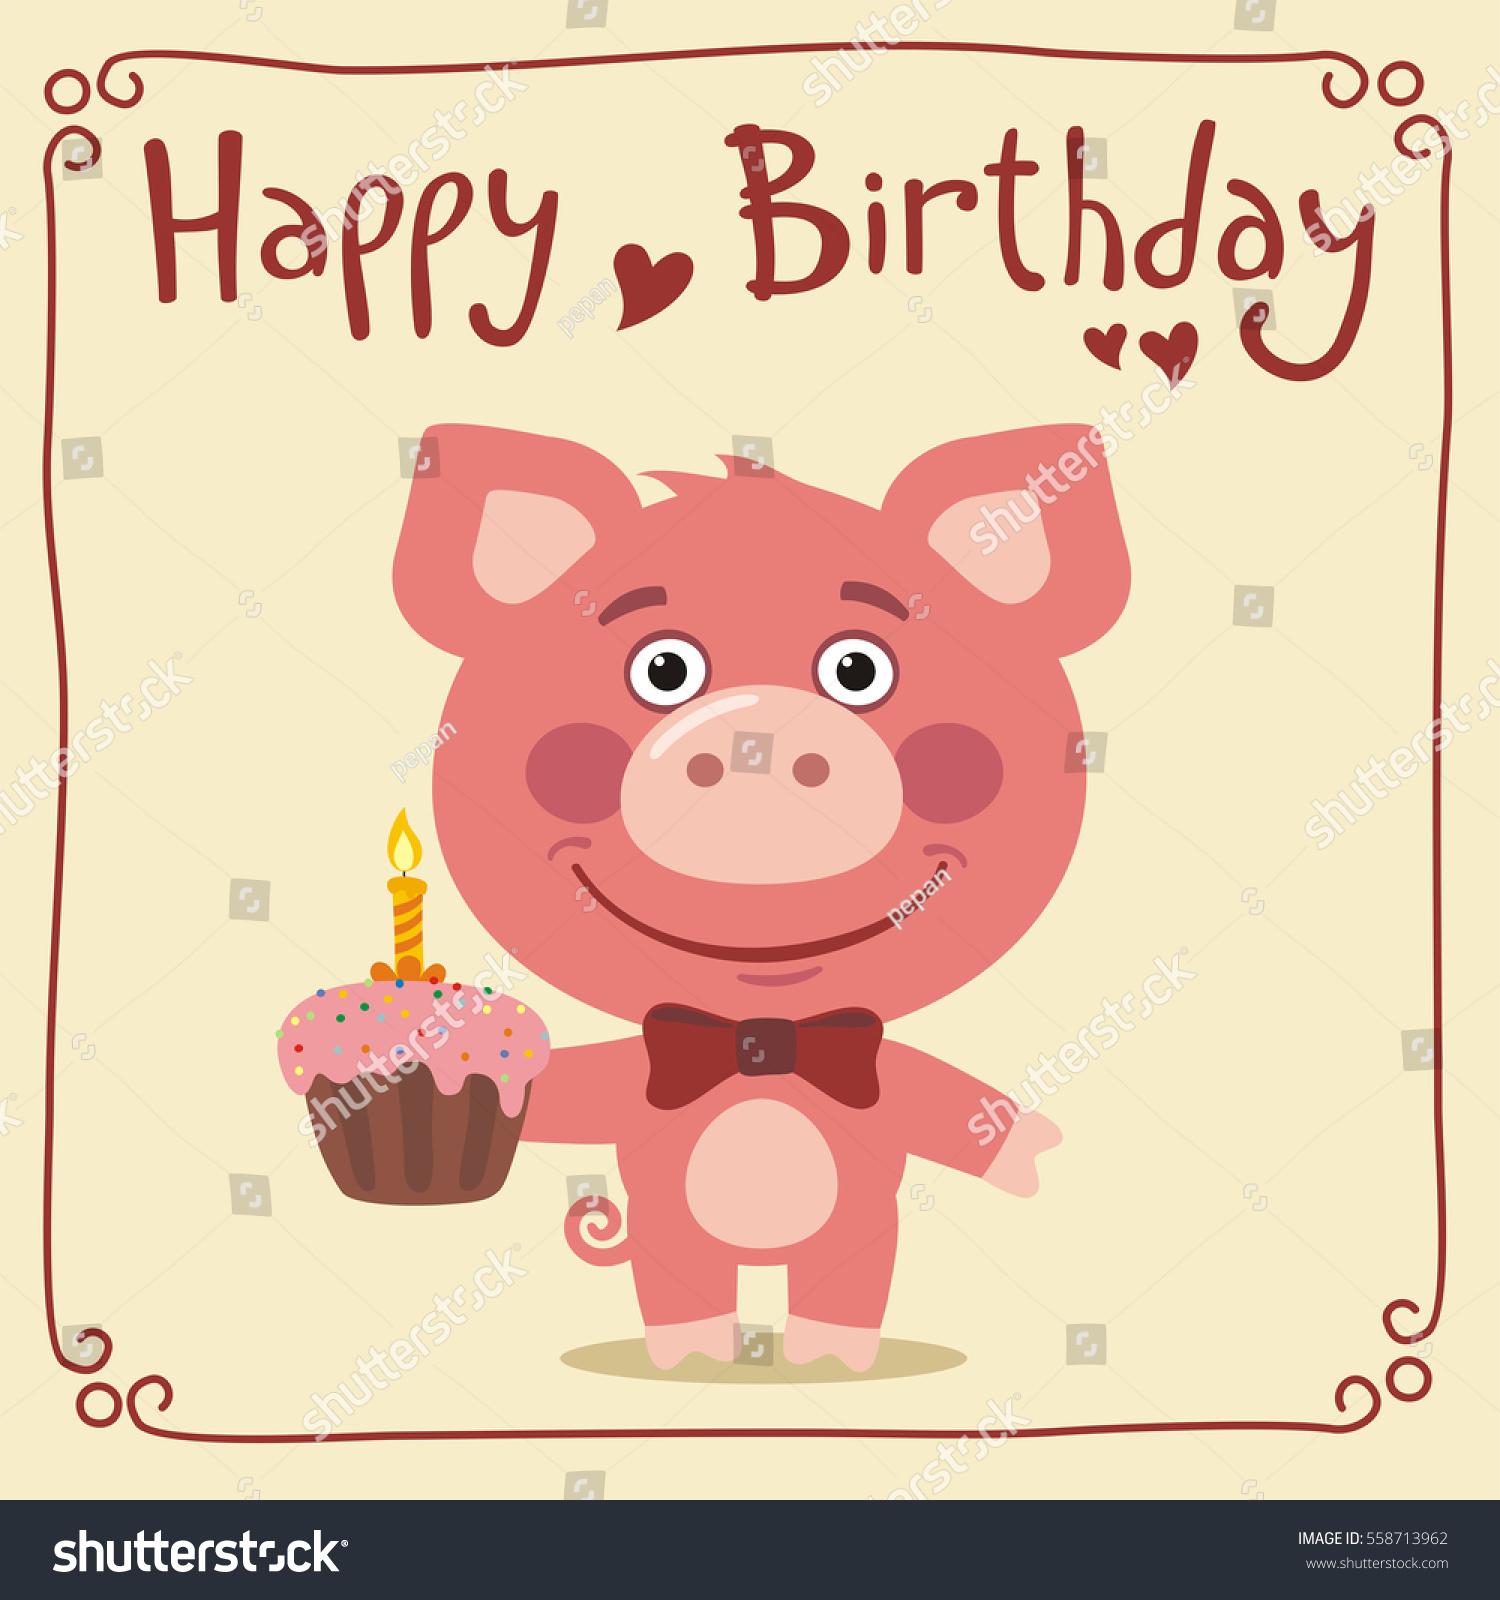 Happy Birthday Funny Pig Cake Greeting Stock Vector 558713962